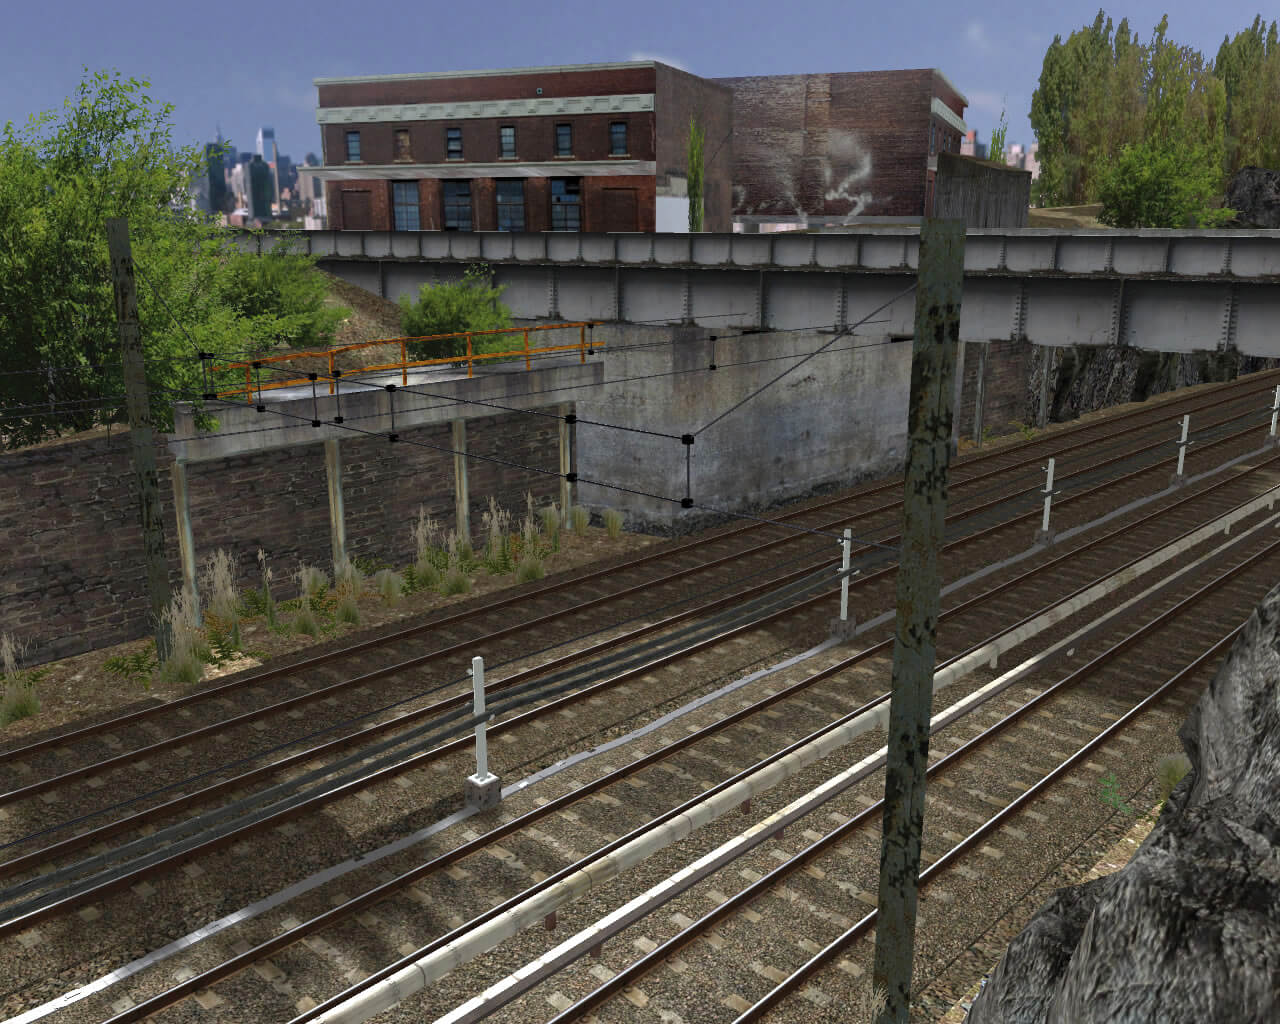 World of Subways 1 – The Path